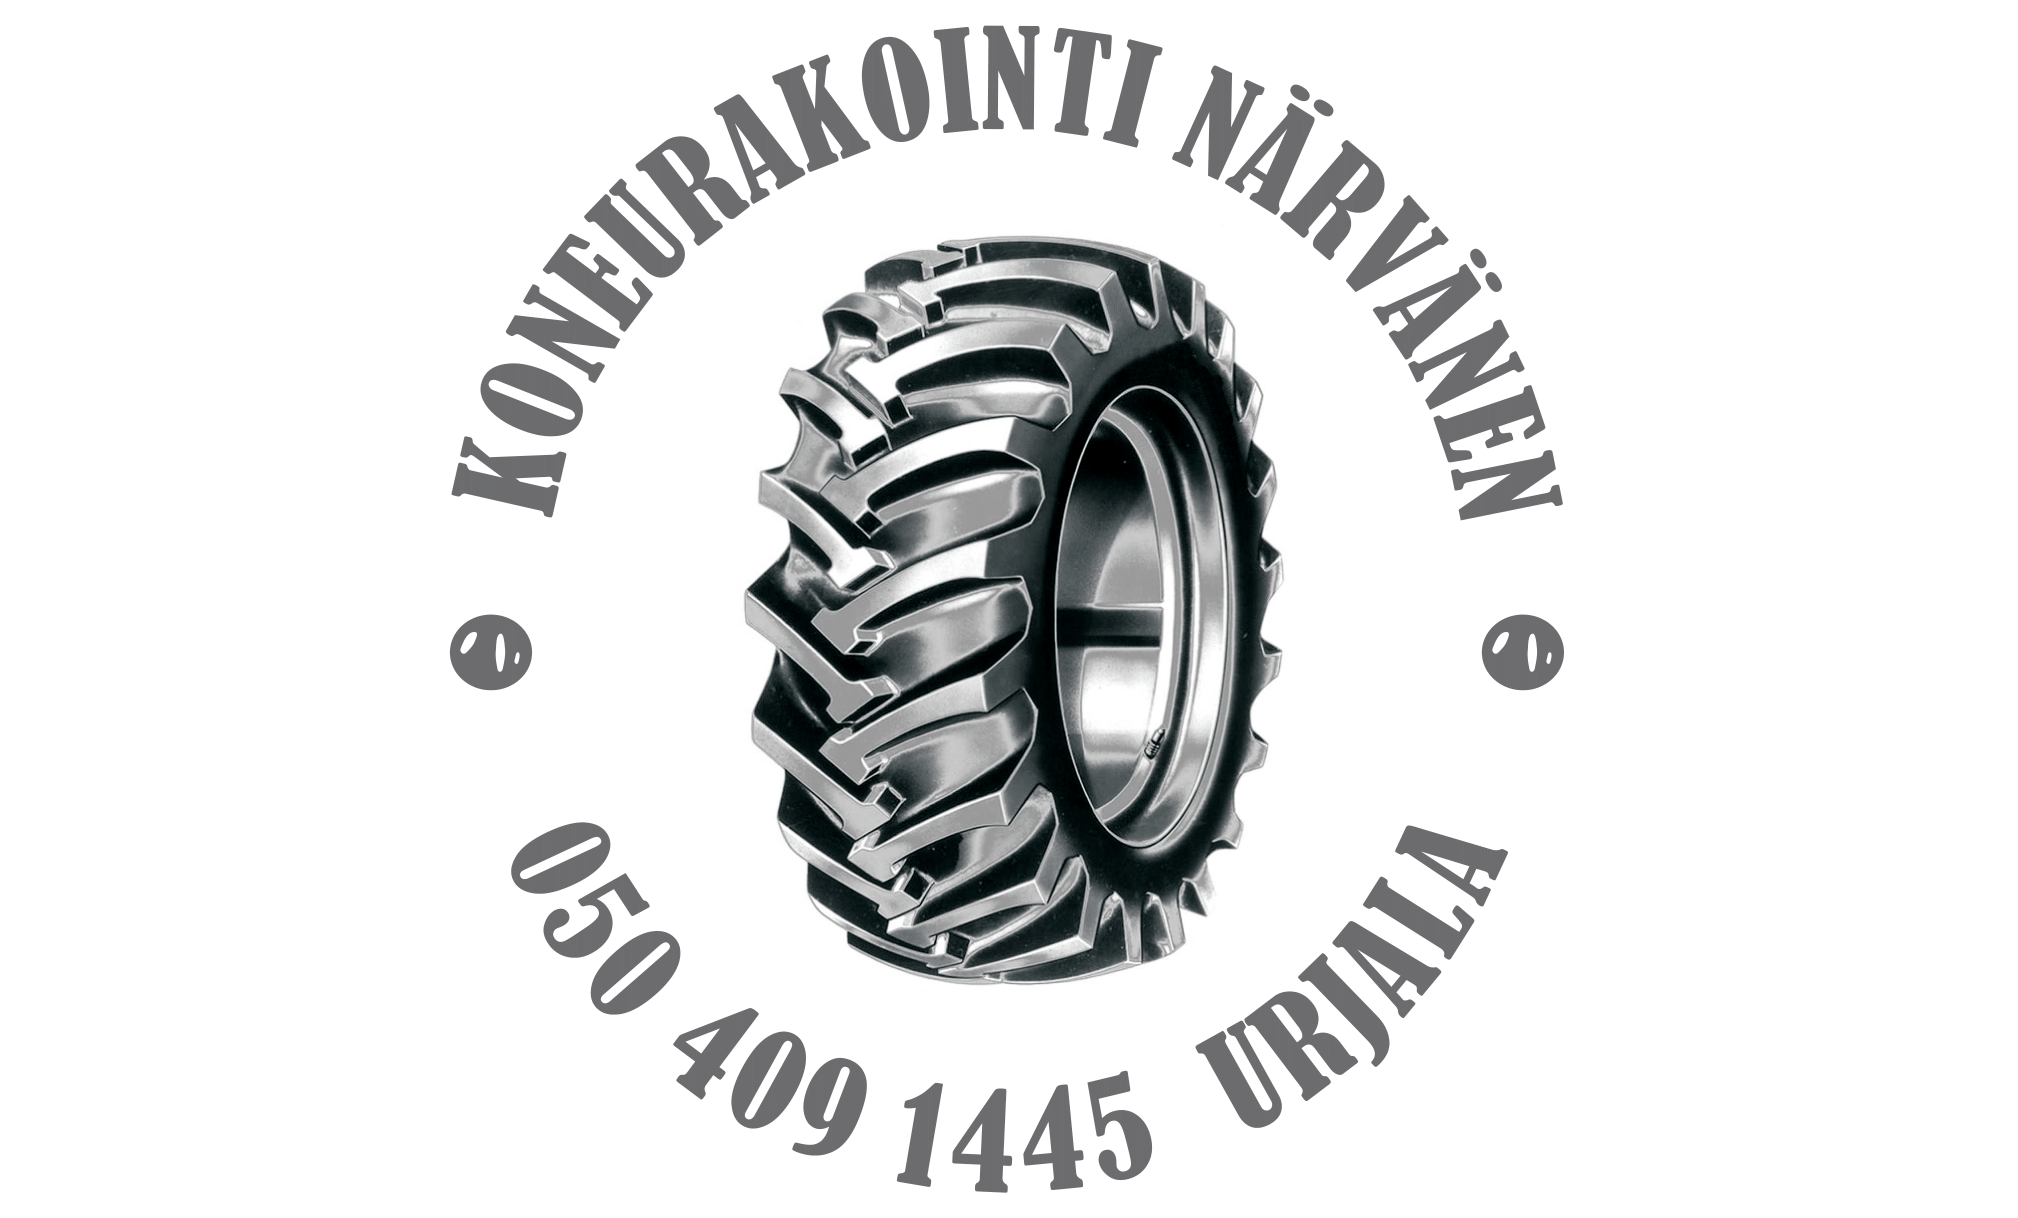 koneurakointi-narvanen-logo-2